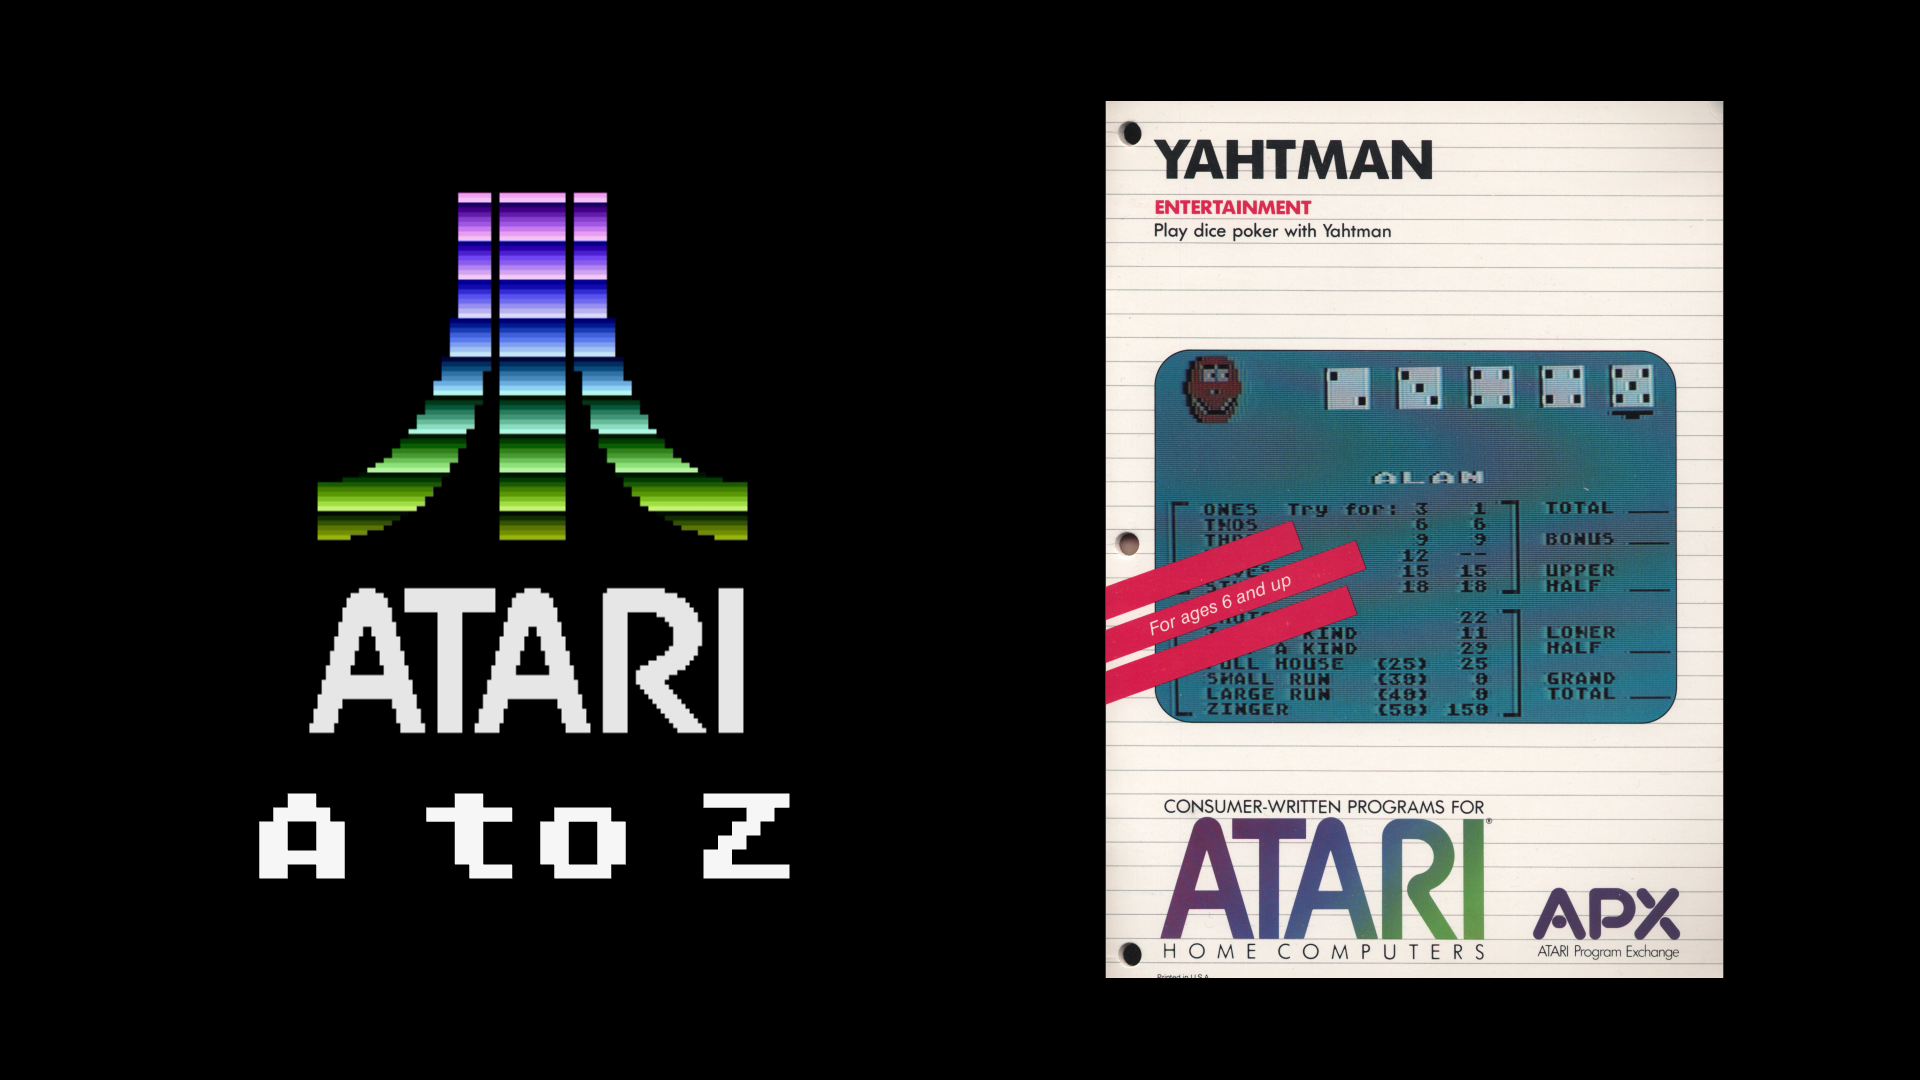 Atari A to Z: Yahtman | MoeGamer